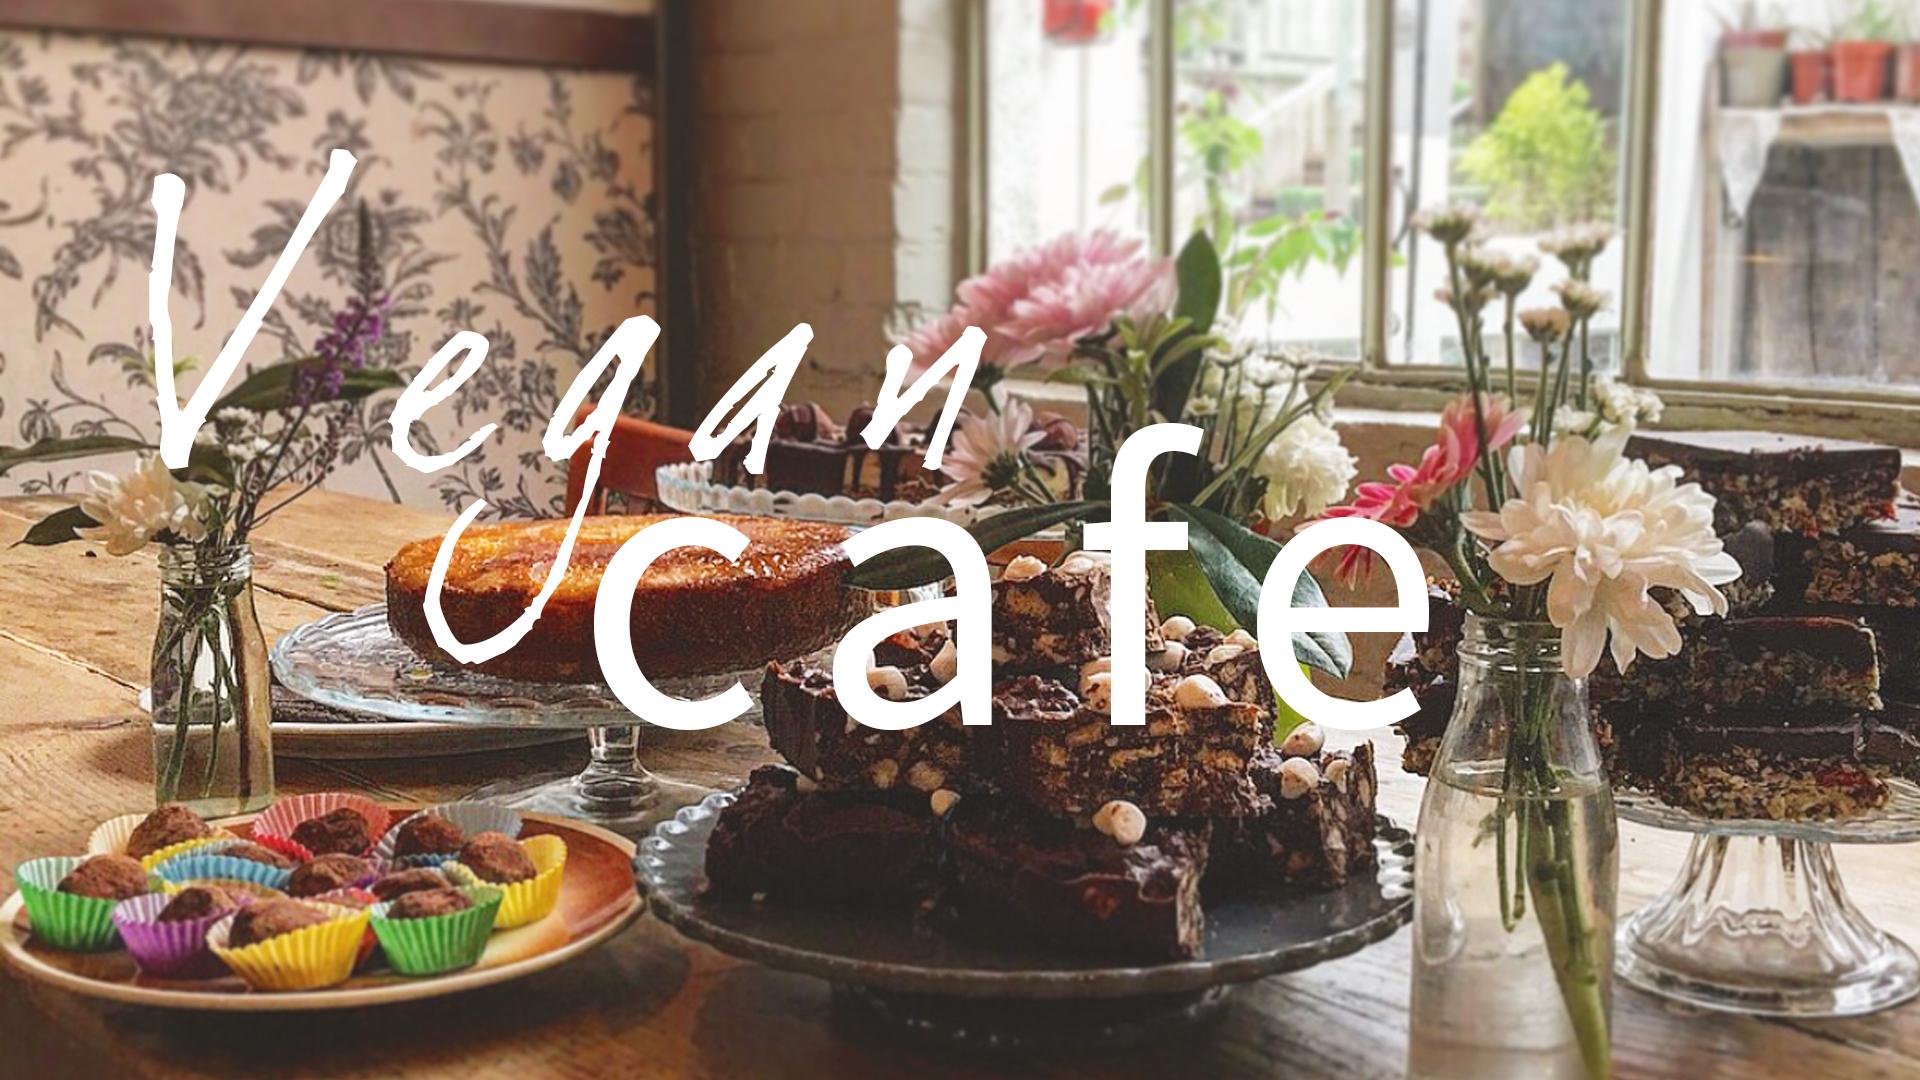 vegan cafe beetroot sauvage edinburgh cakes